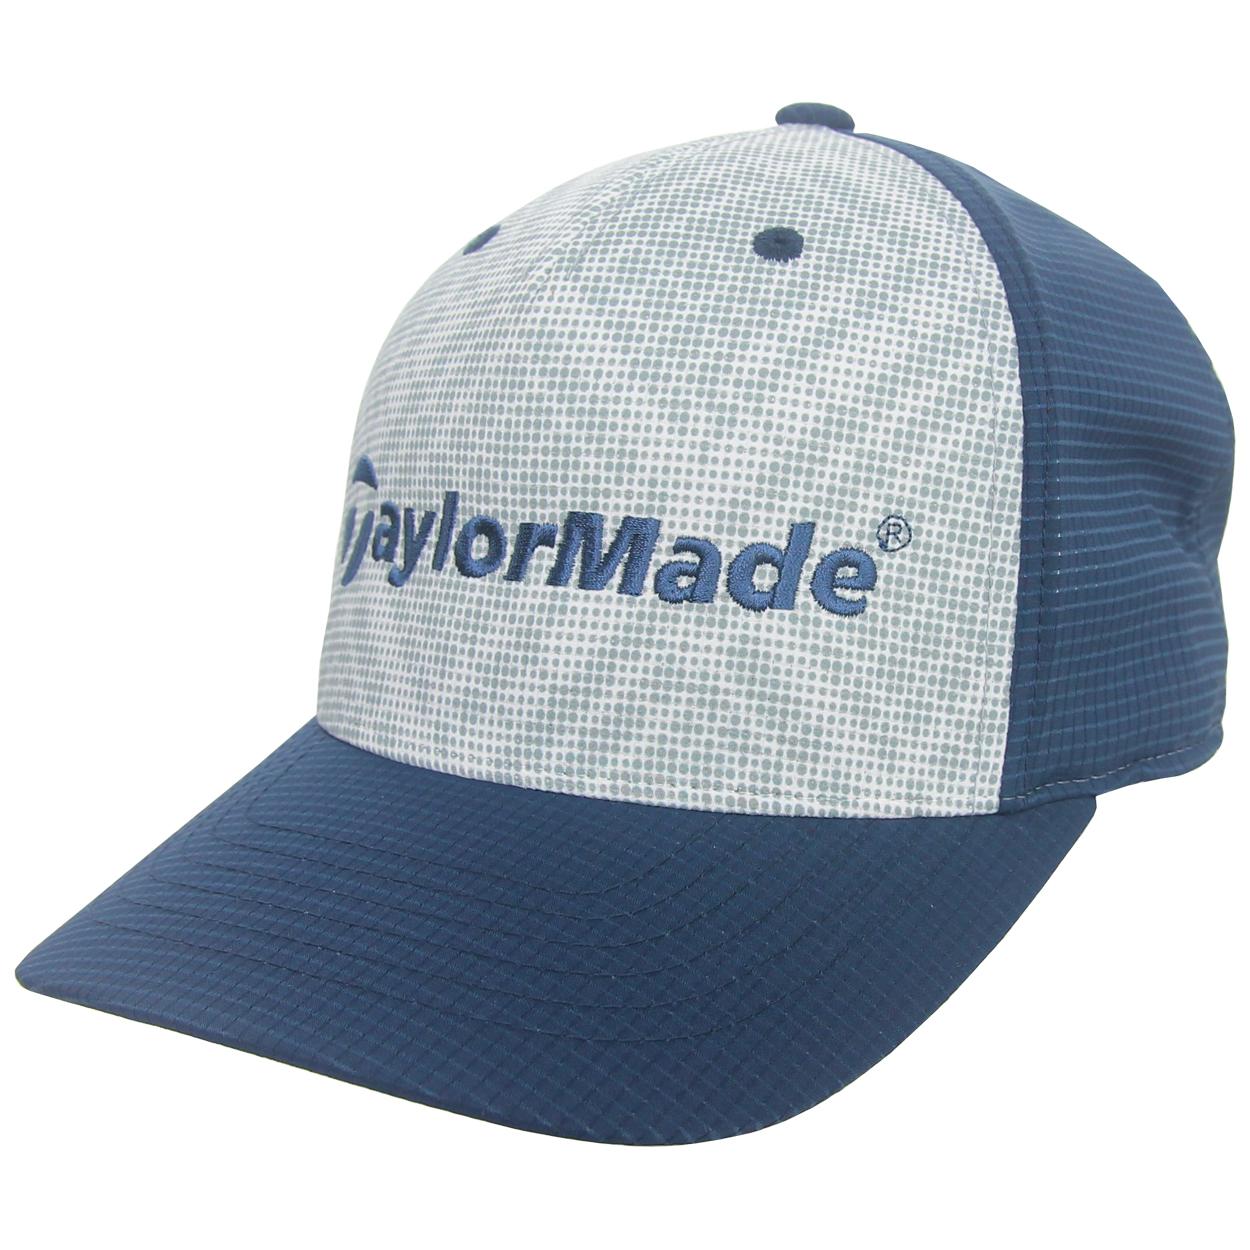 a4e04cb81b8 TaylorMade Adidas ClimaCool Flexfit Tech 110 Snapback Hat ...